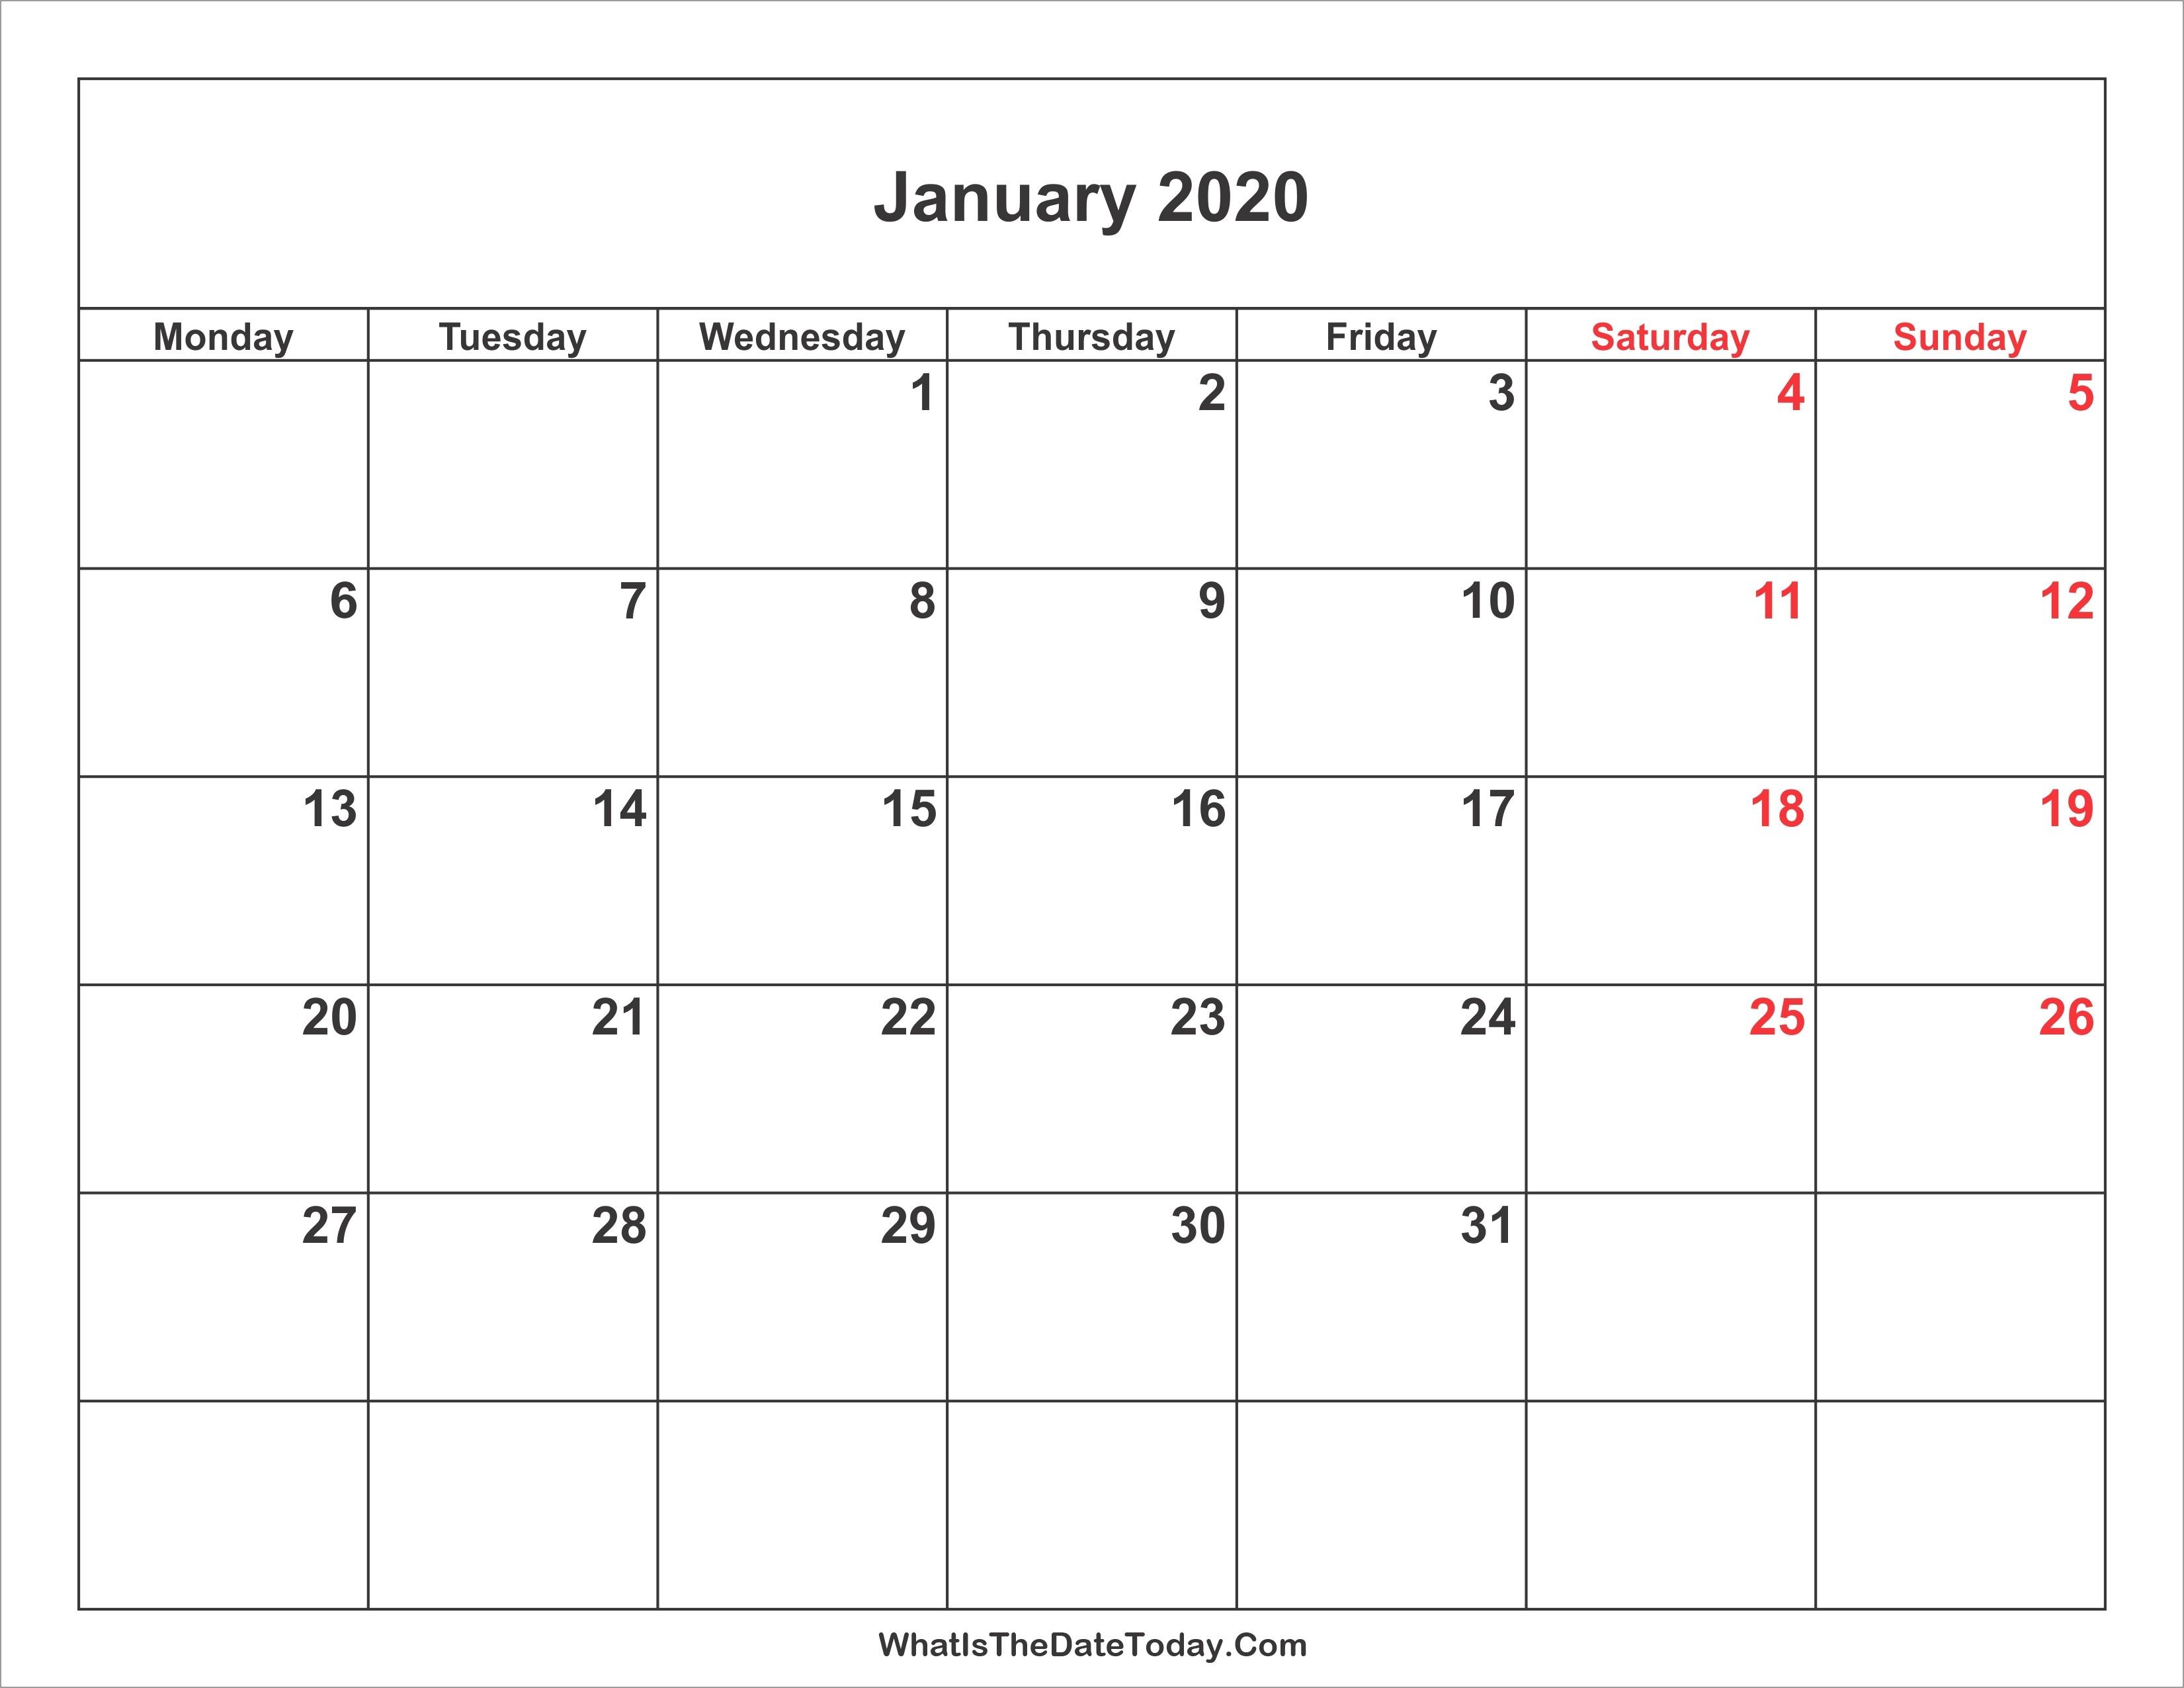 January 2020 Calendar | Jcreview-January 2020 Calendar Philippines